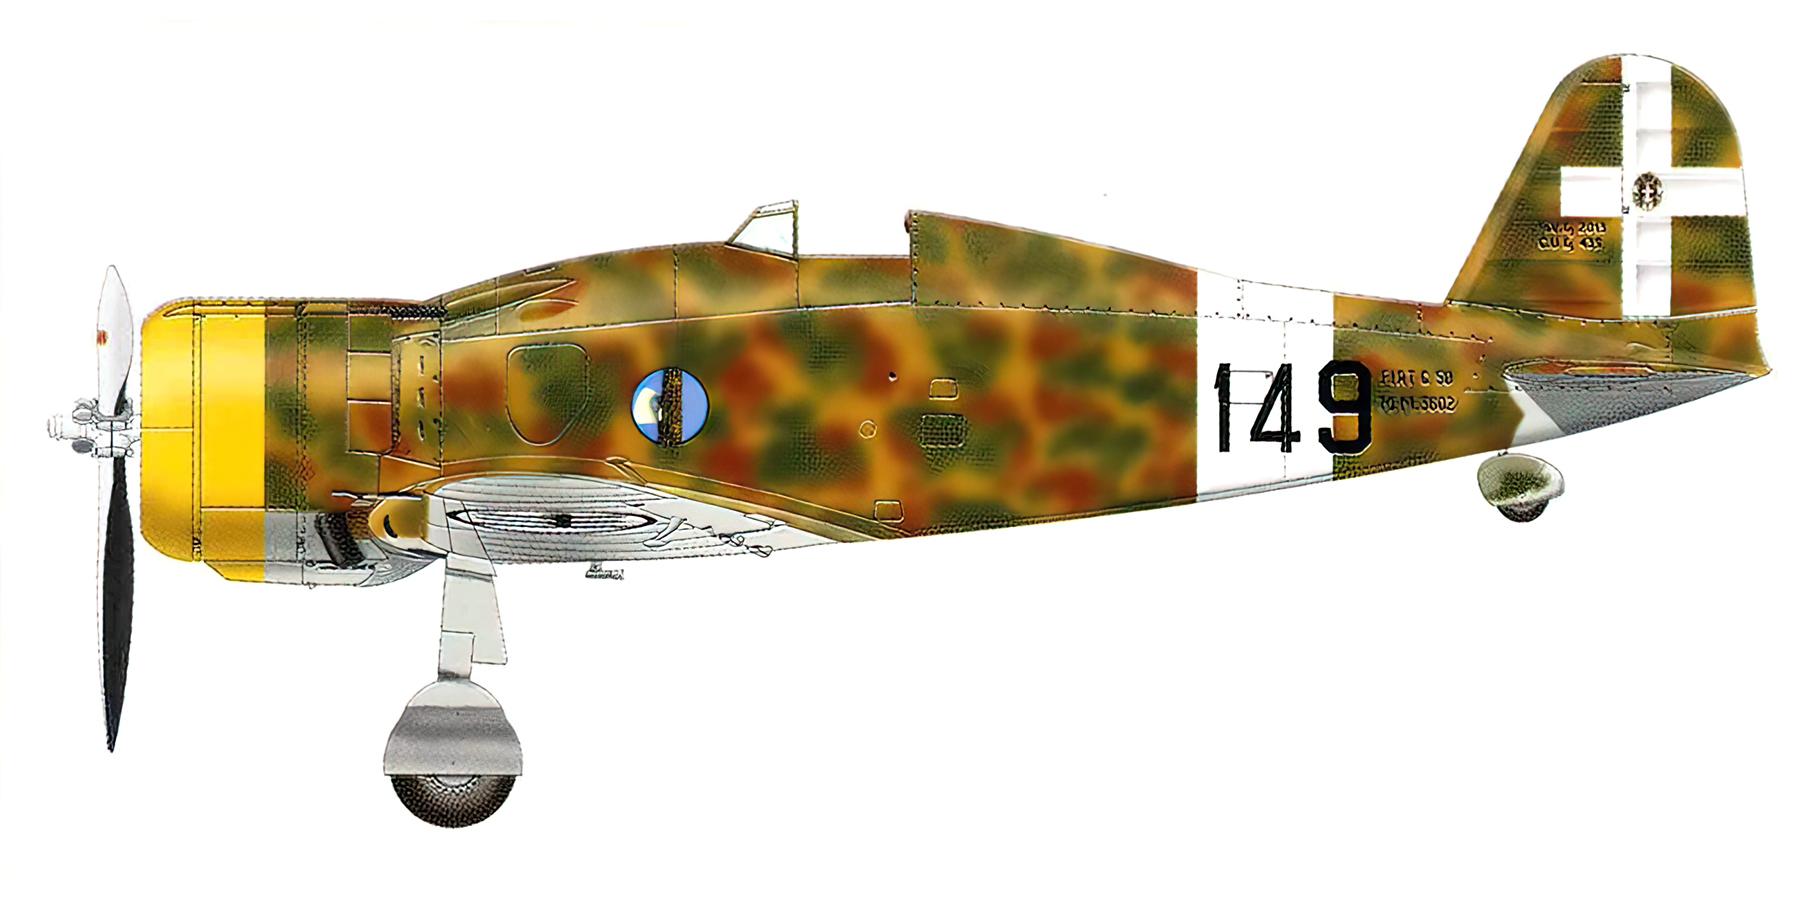 Fiat G50 Freccia prototype MM3602 149 training unit Italy 1941 0A